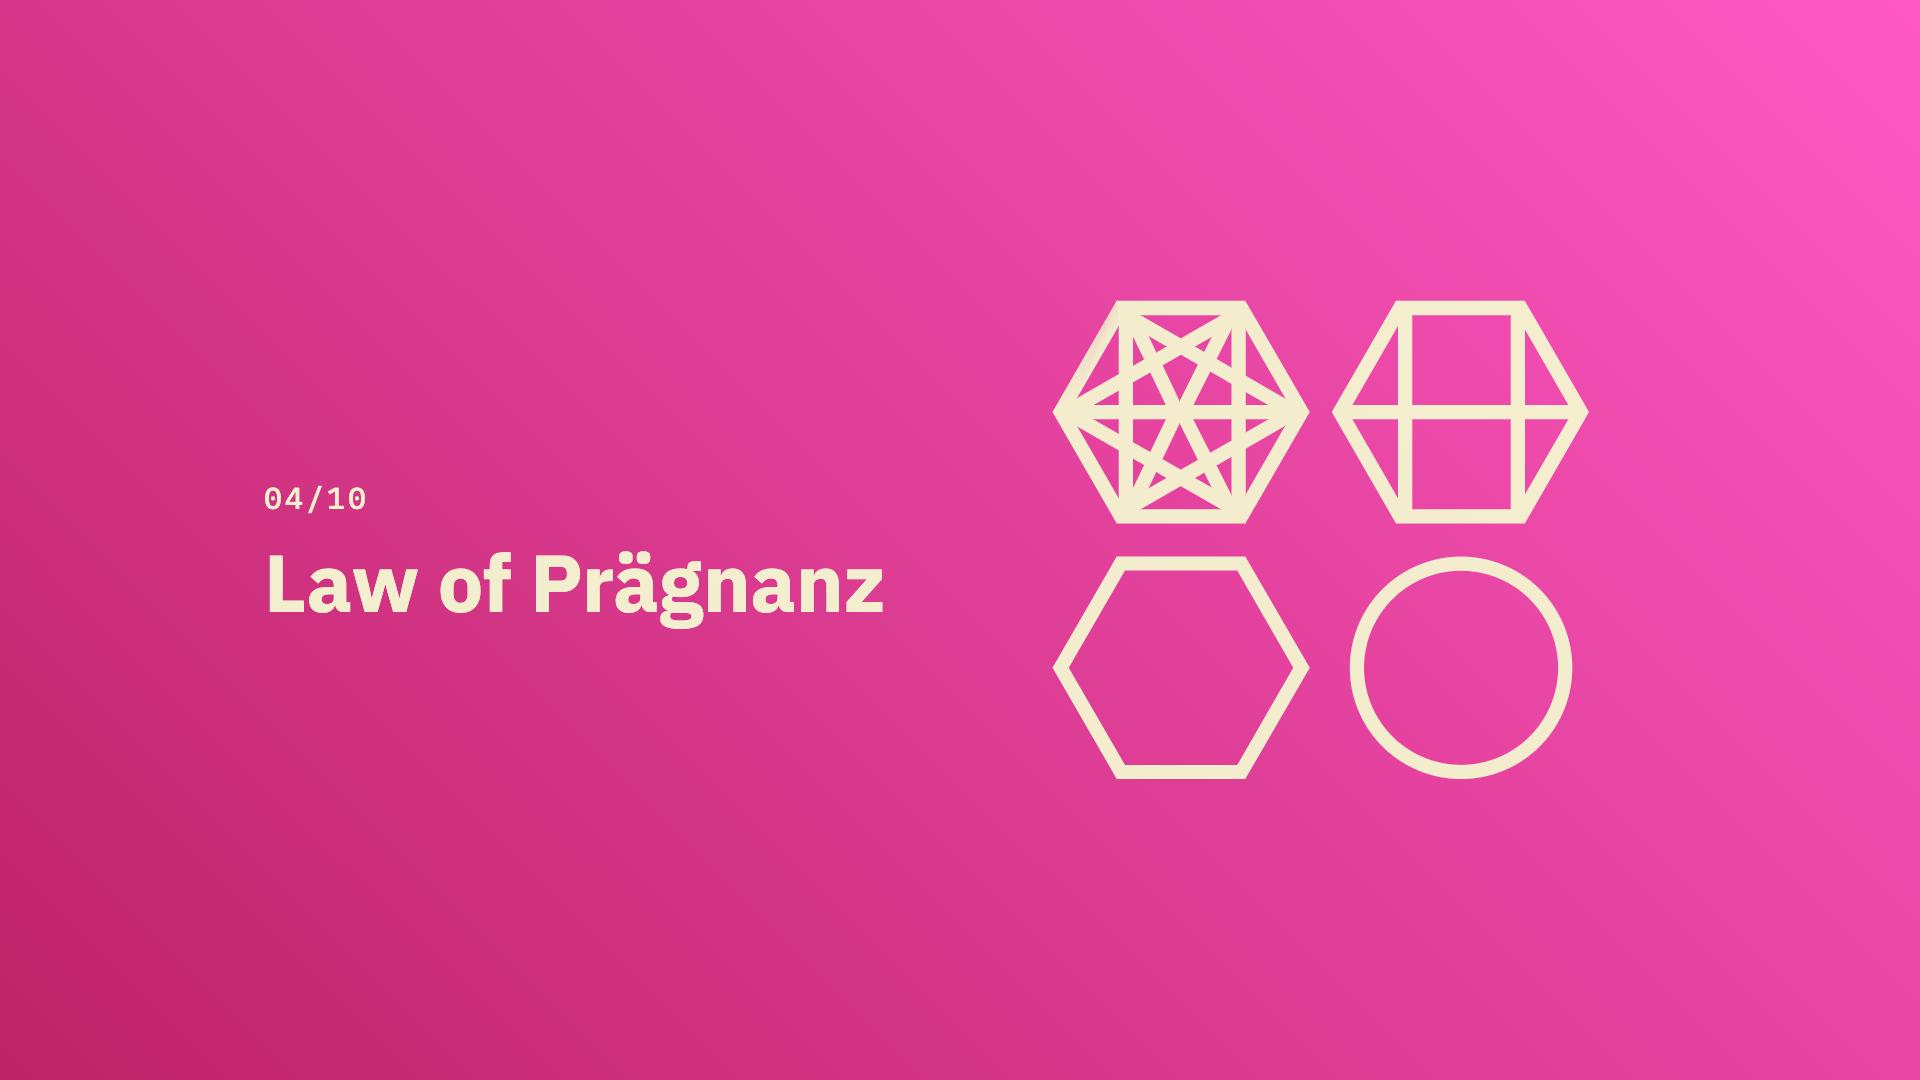 Law of Prägnanz - Source: lawsofux.com